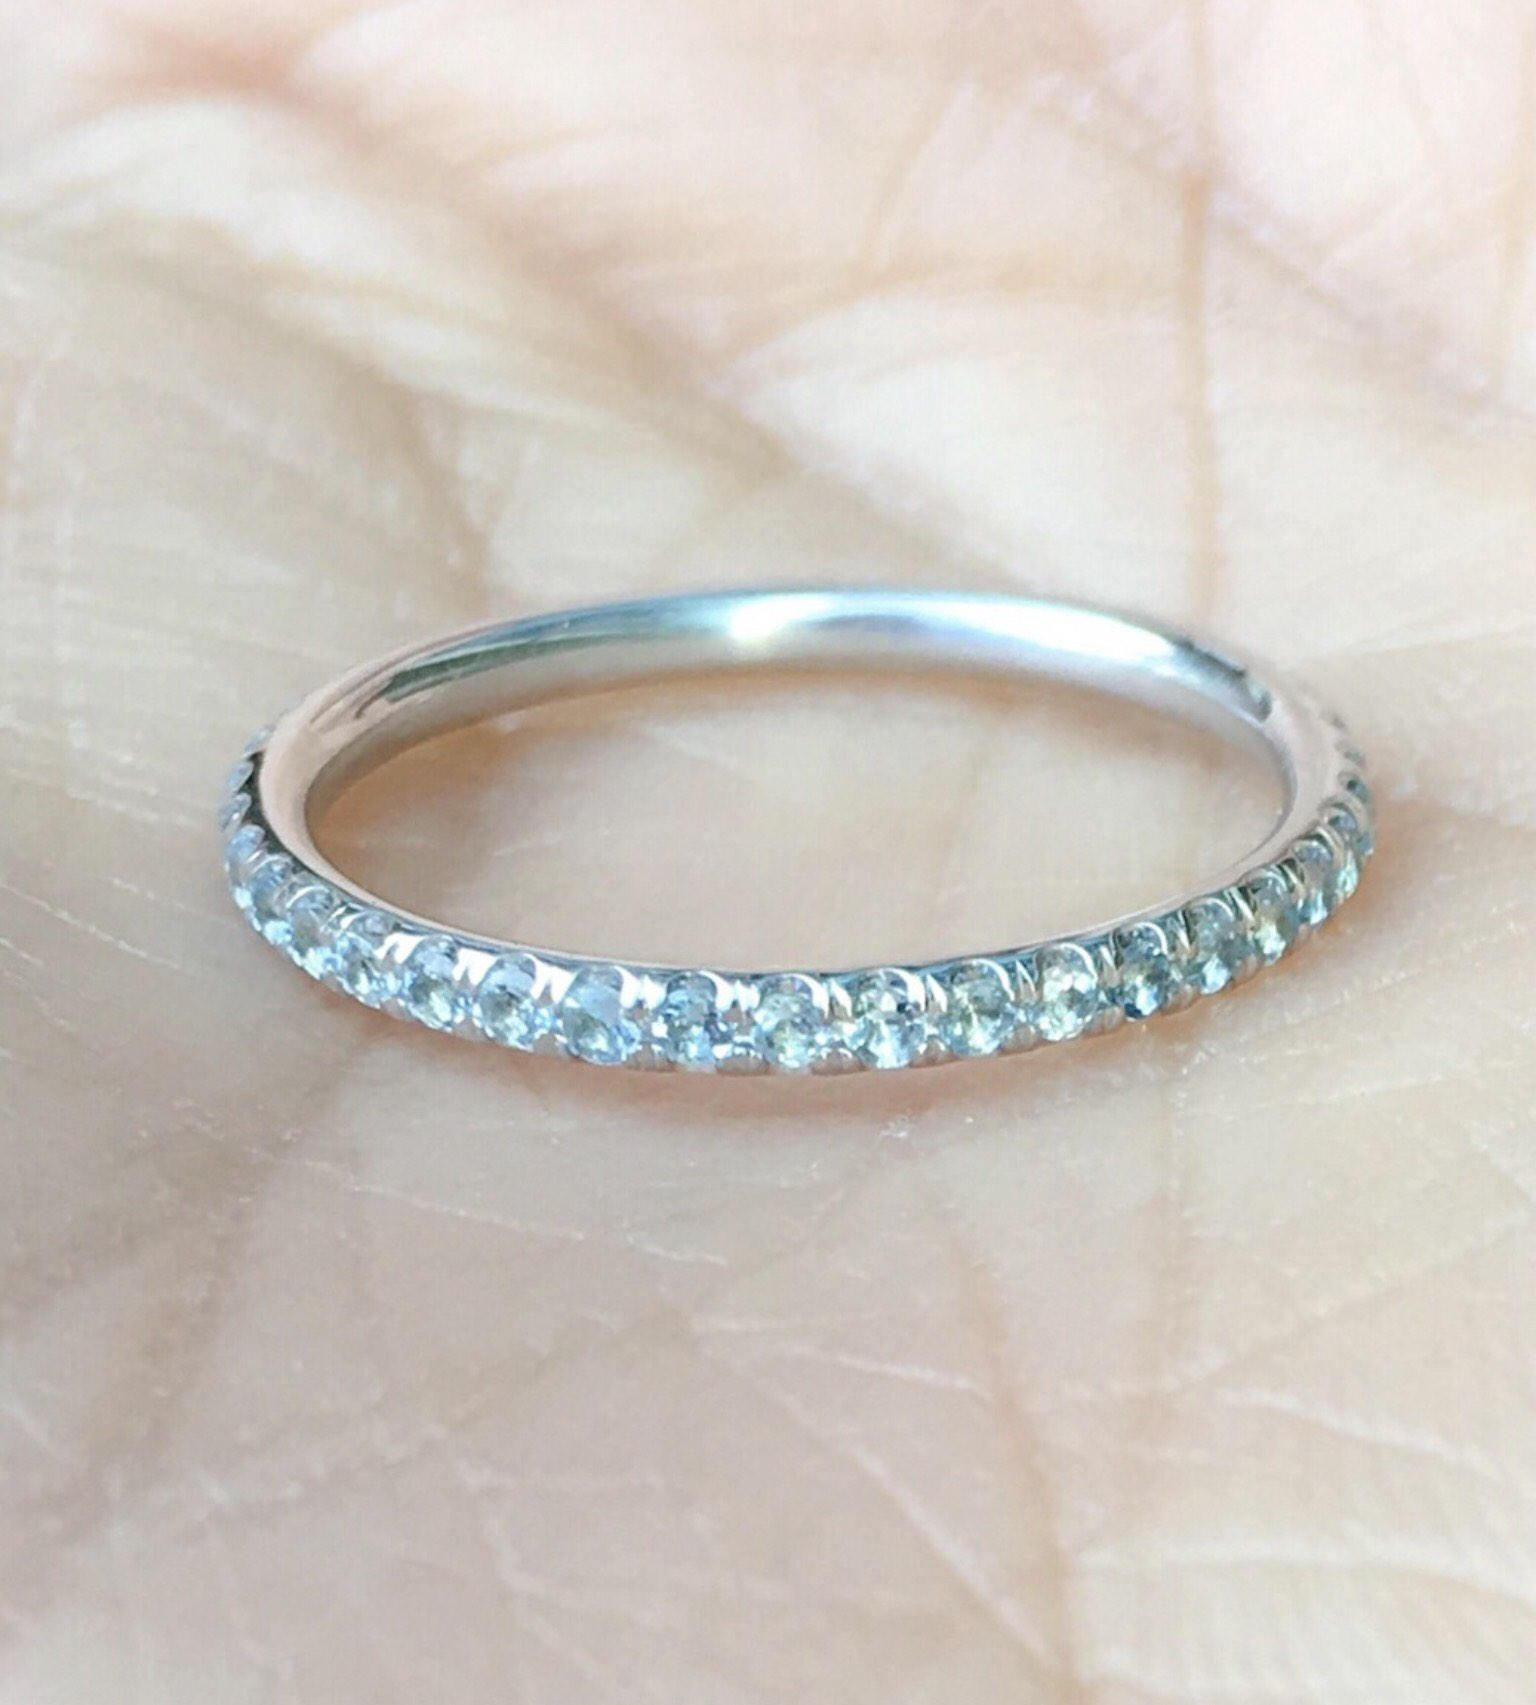 14k White Gold Finish Diamond Half Eternity Band Stackable Ring Wedding Band